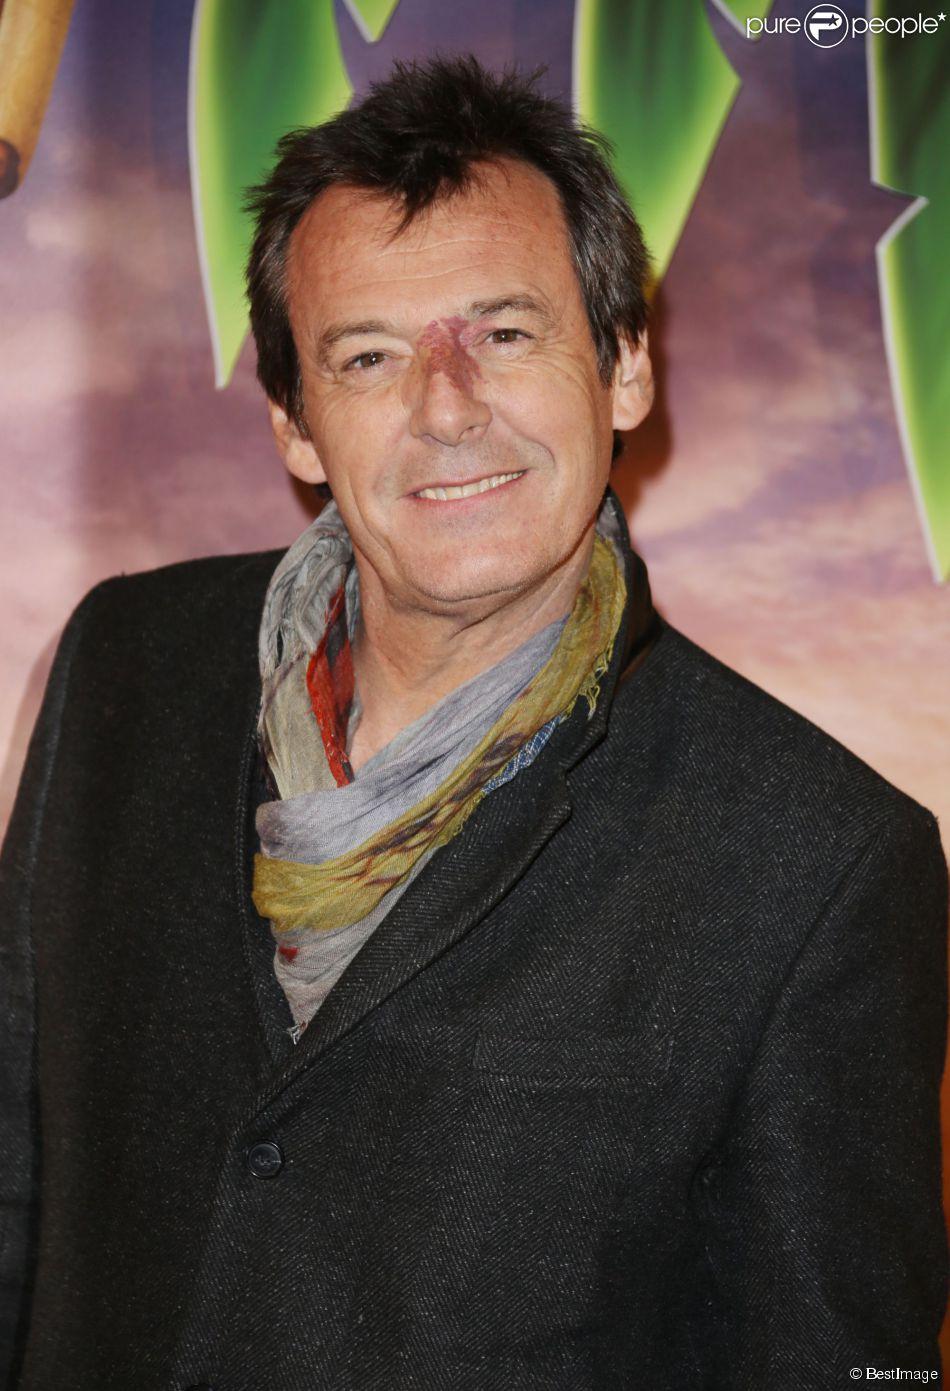 Jean luc reichmann avant premi re du film clochette et la f e pirate au gaumont ma - Fee clochette et les pirates ...